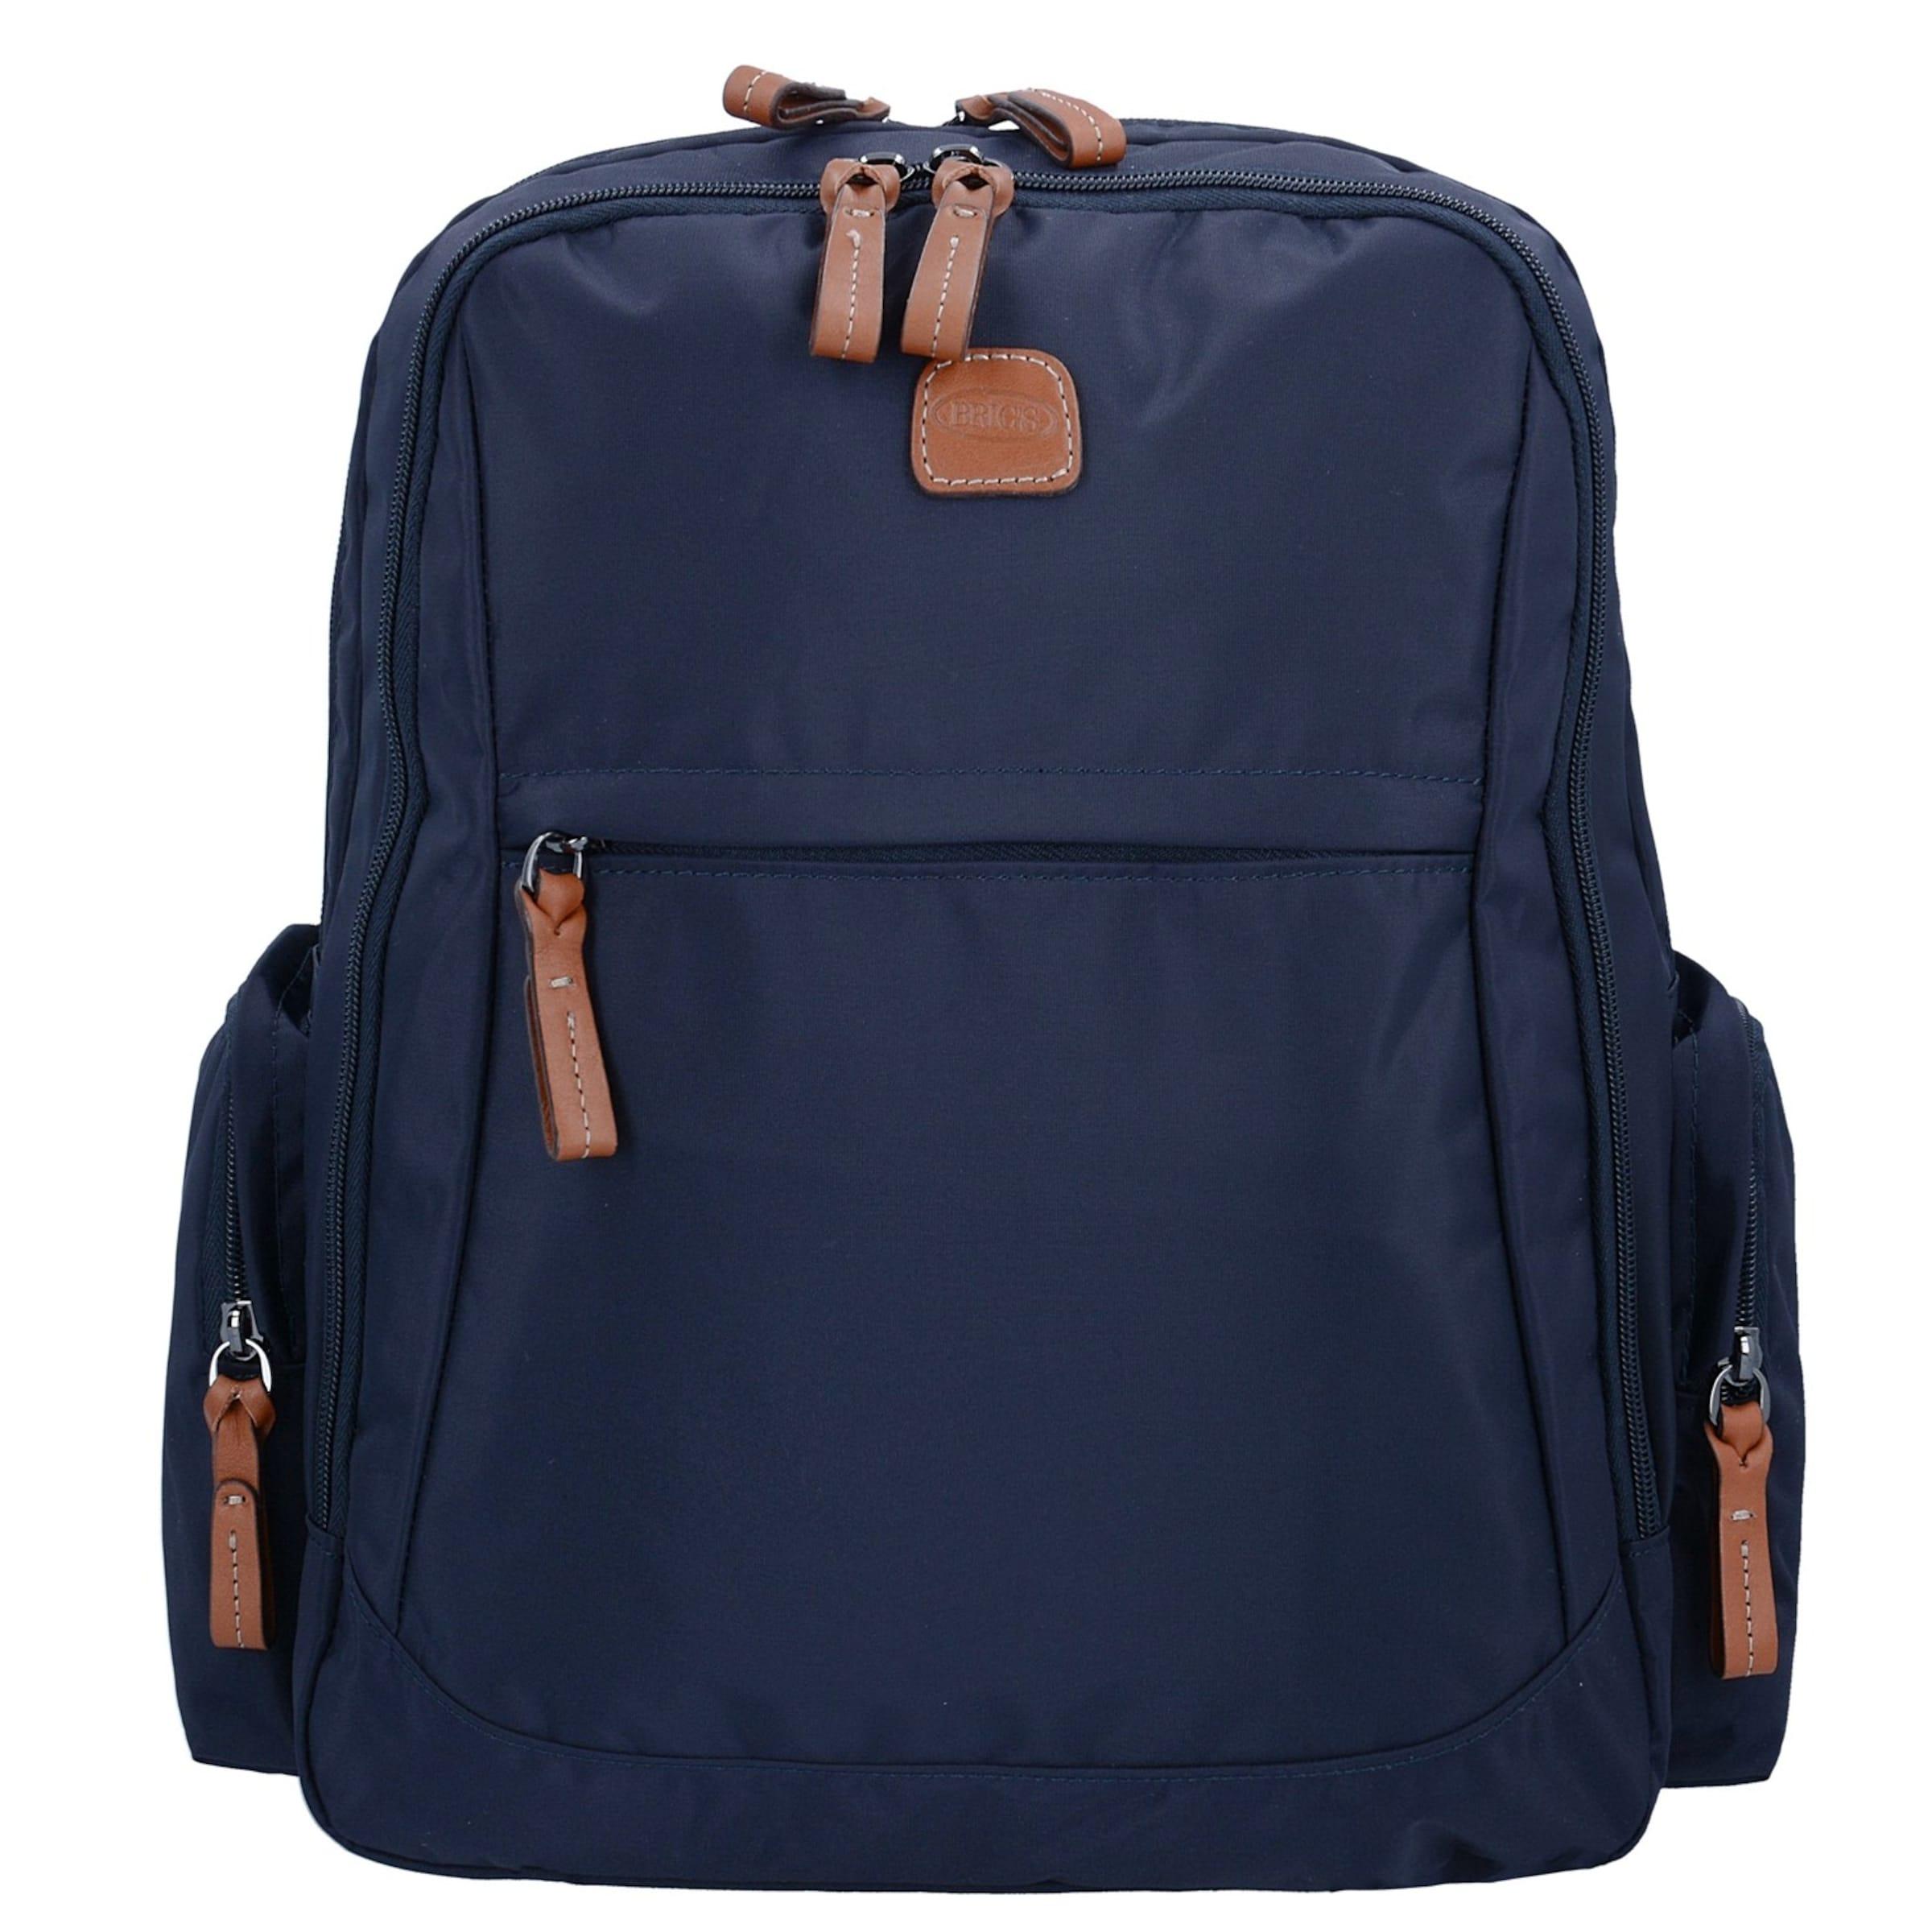 Bric's X-Travel Rucksack 38 cm Laptopfach Footlocker Finish Verkauf Online Mbde0vQ